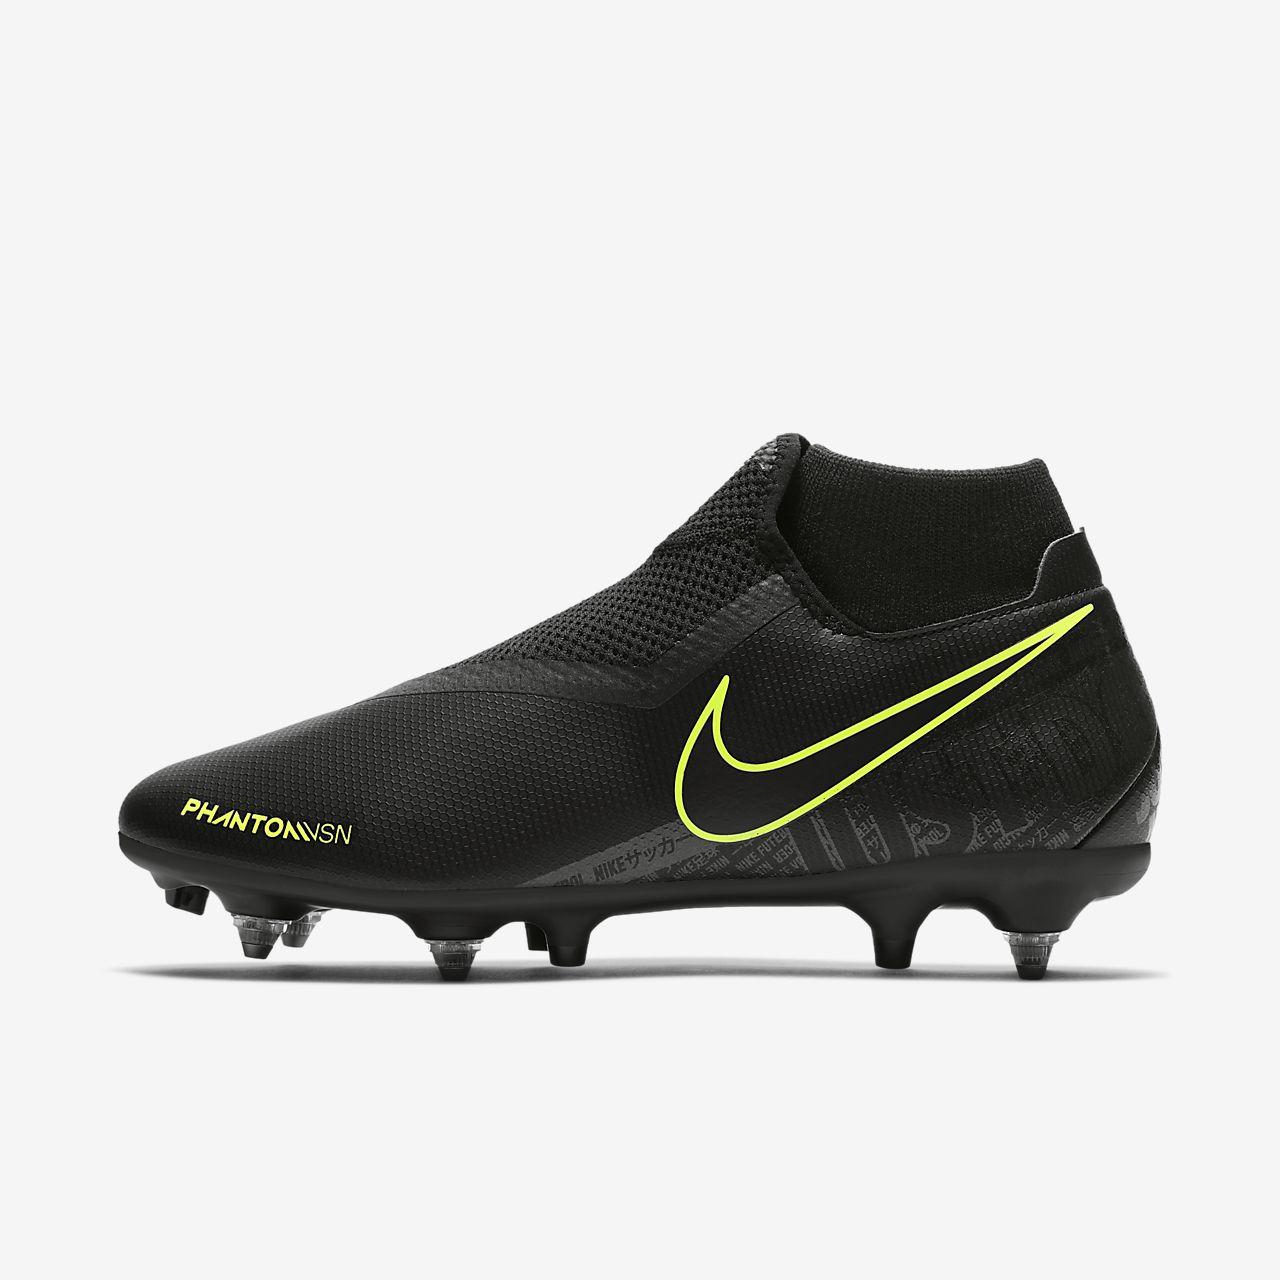 Chaussure de football à crampons pour terrain gras Nike PhantomVSN Academy Dynamic Fit SG-Pro Anti-Clog Traction